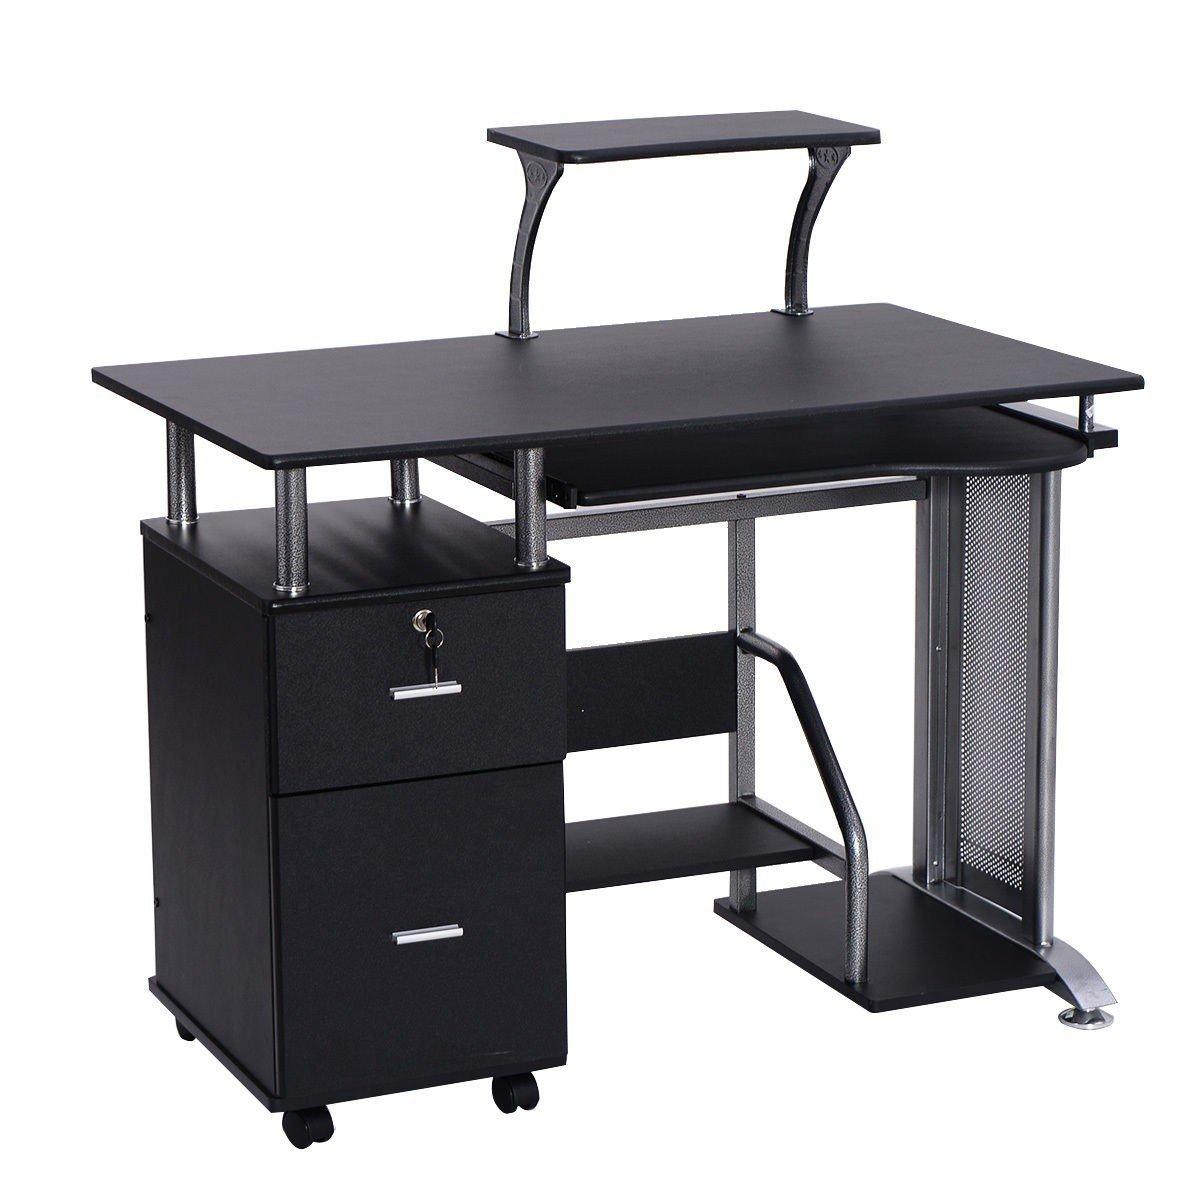 Black Computer Desk with Printer Shelf by Apontus (Image #4)